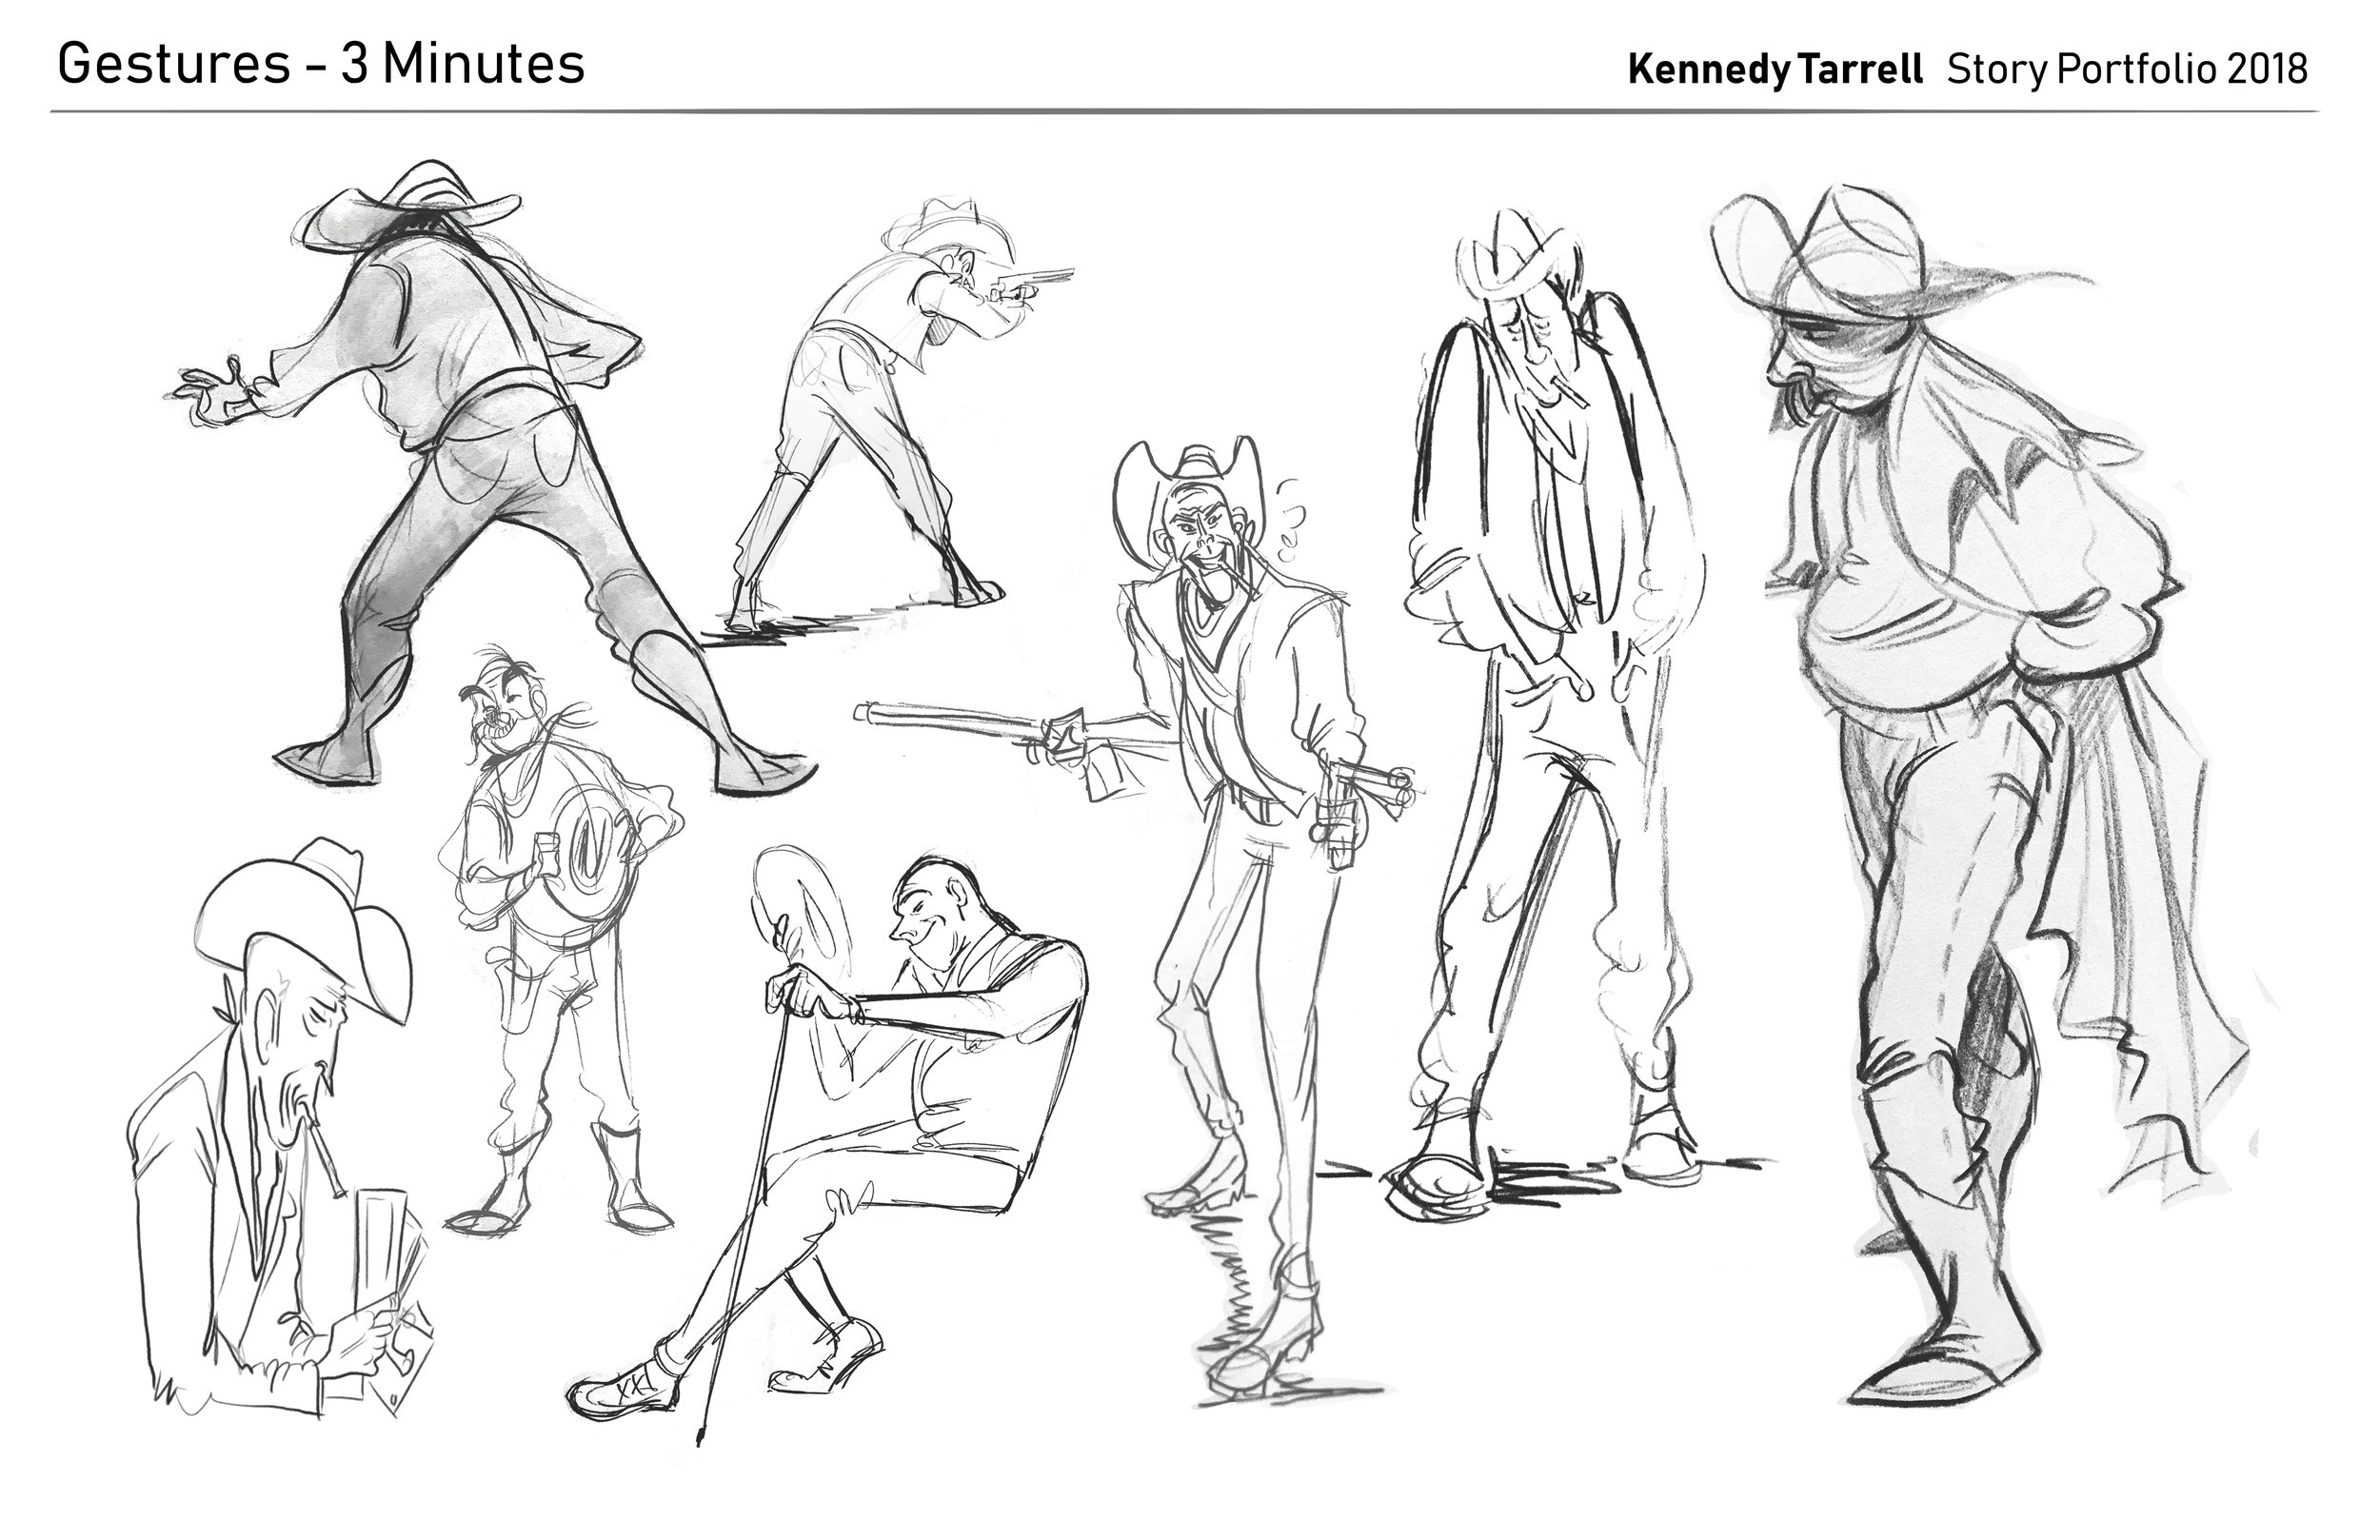 06_KennedyTarrell_Gestures3Min.jpg